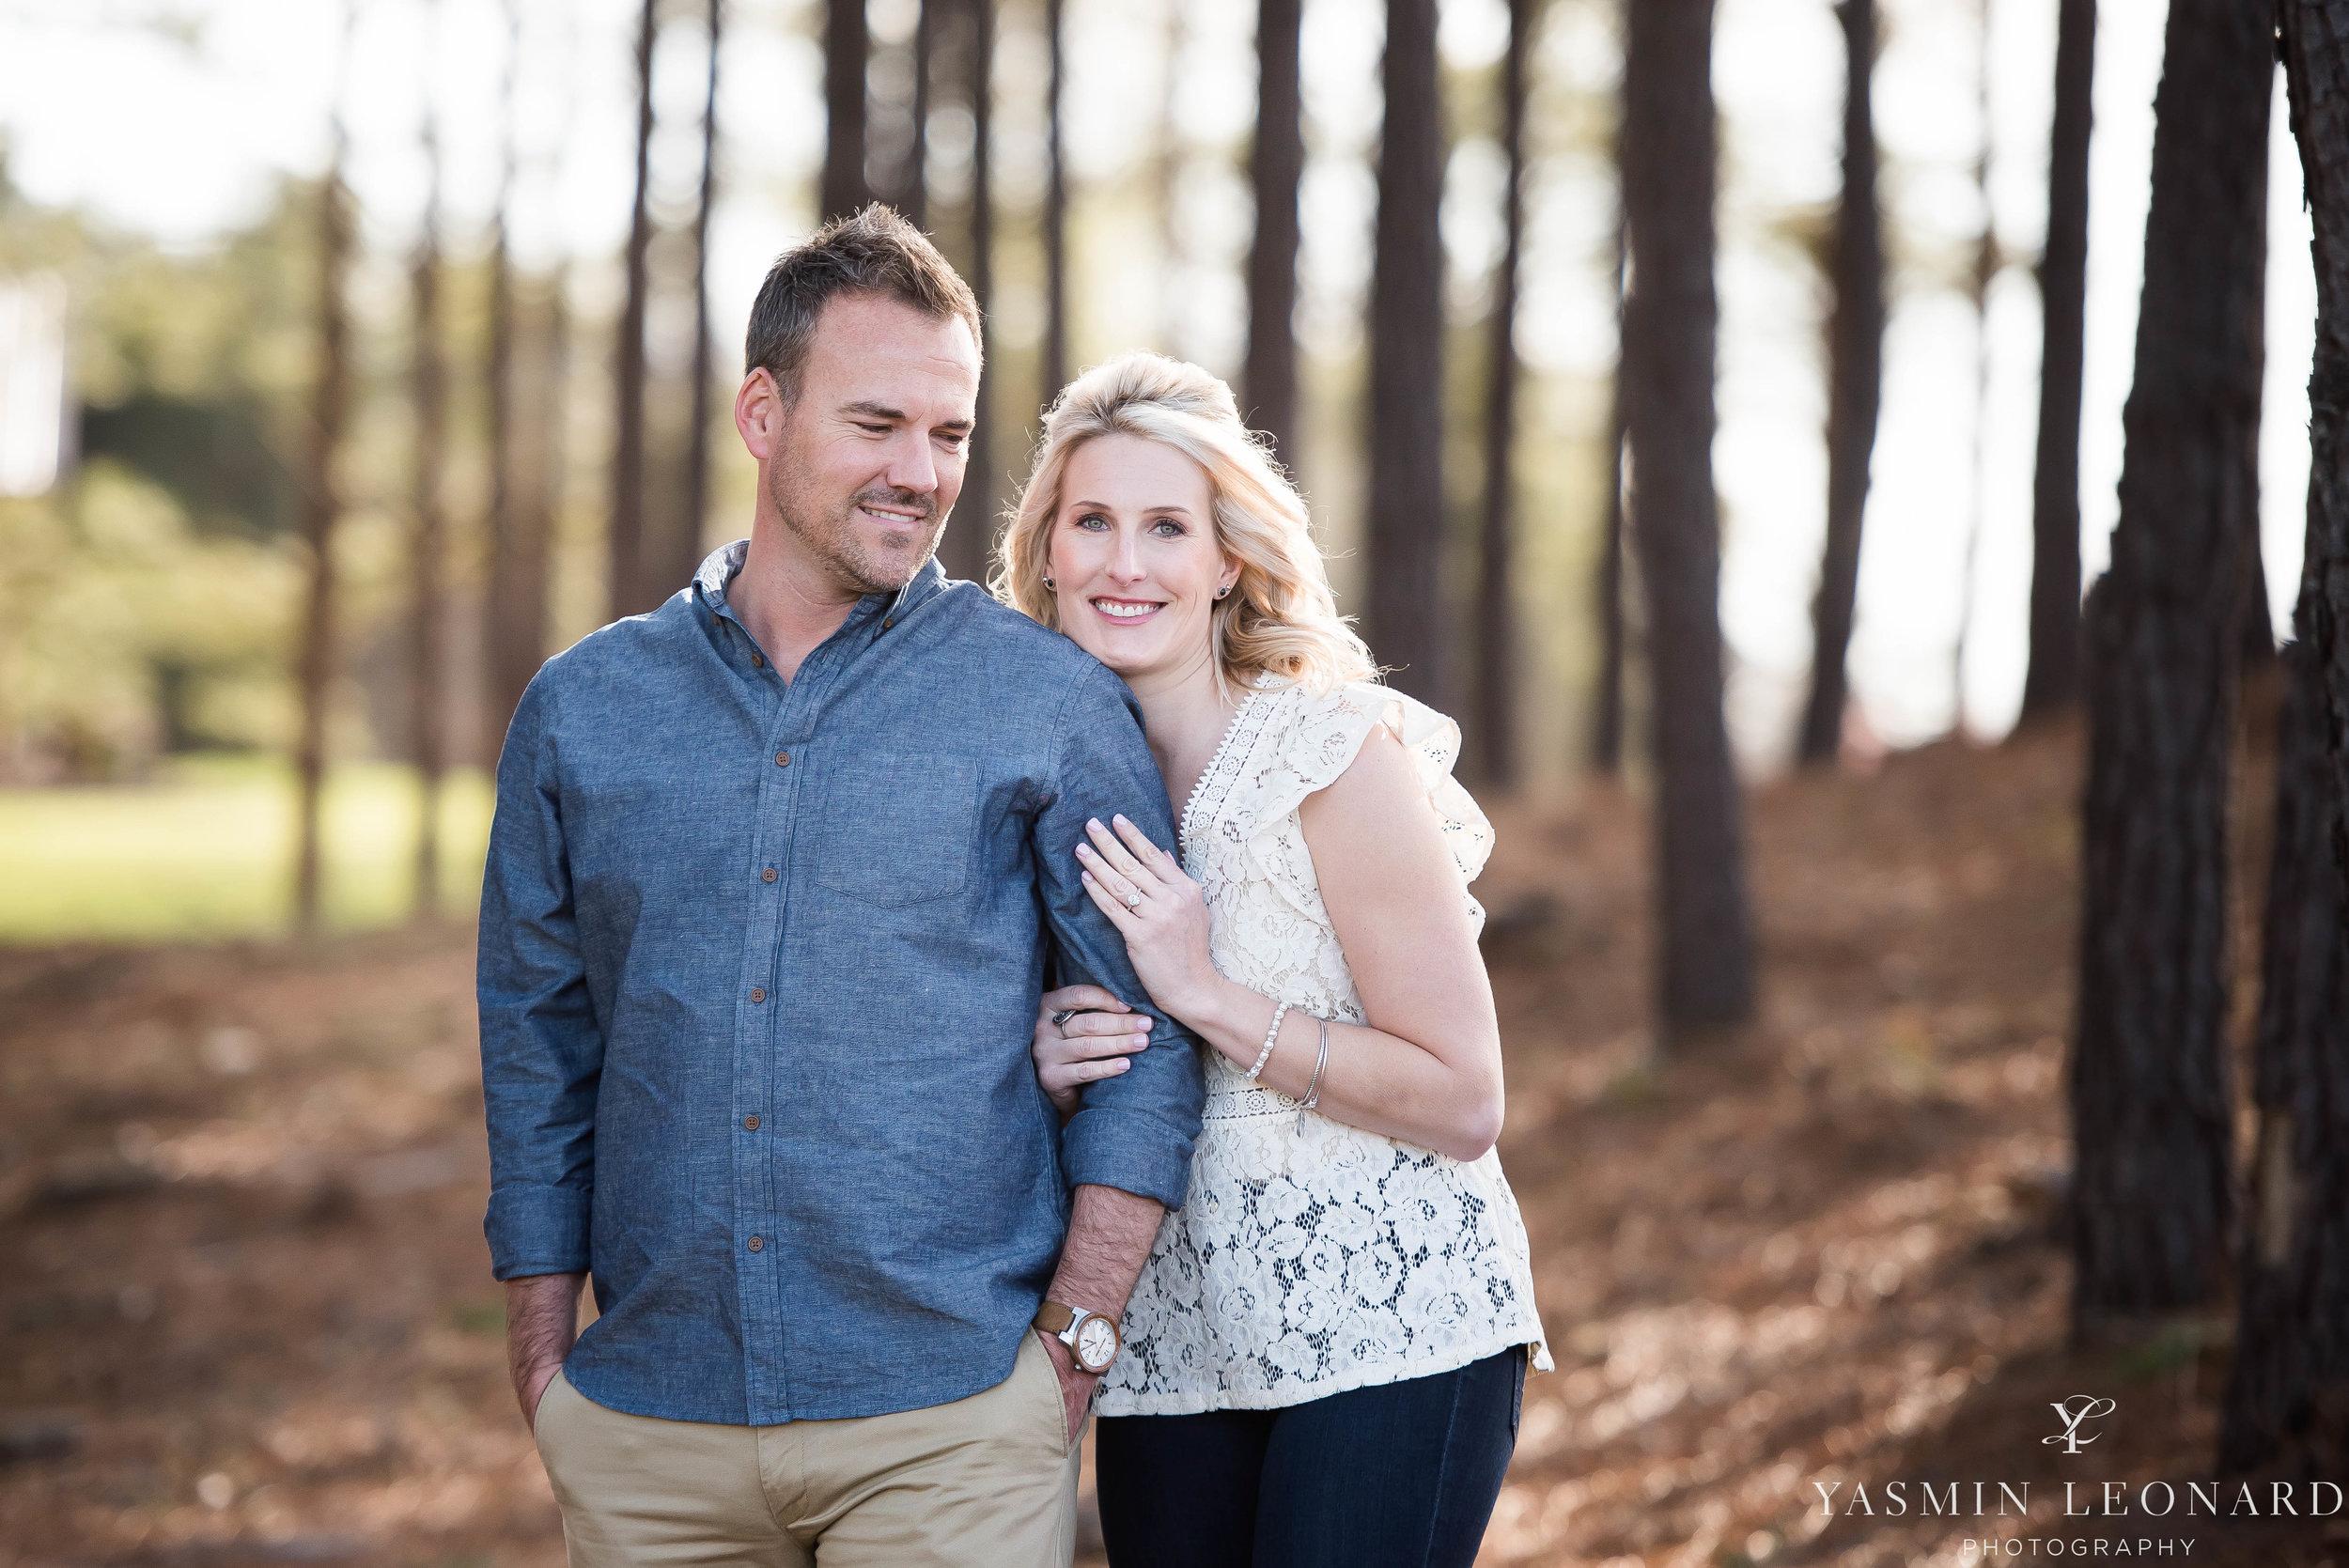 High Point Wedding Photographer - NC Wedding Photographer - Yasmin Leonard Photography - Engagement Poses - Engagement Ideas - Outdoor Engagement Session-7.jpg